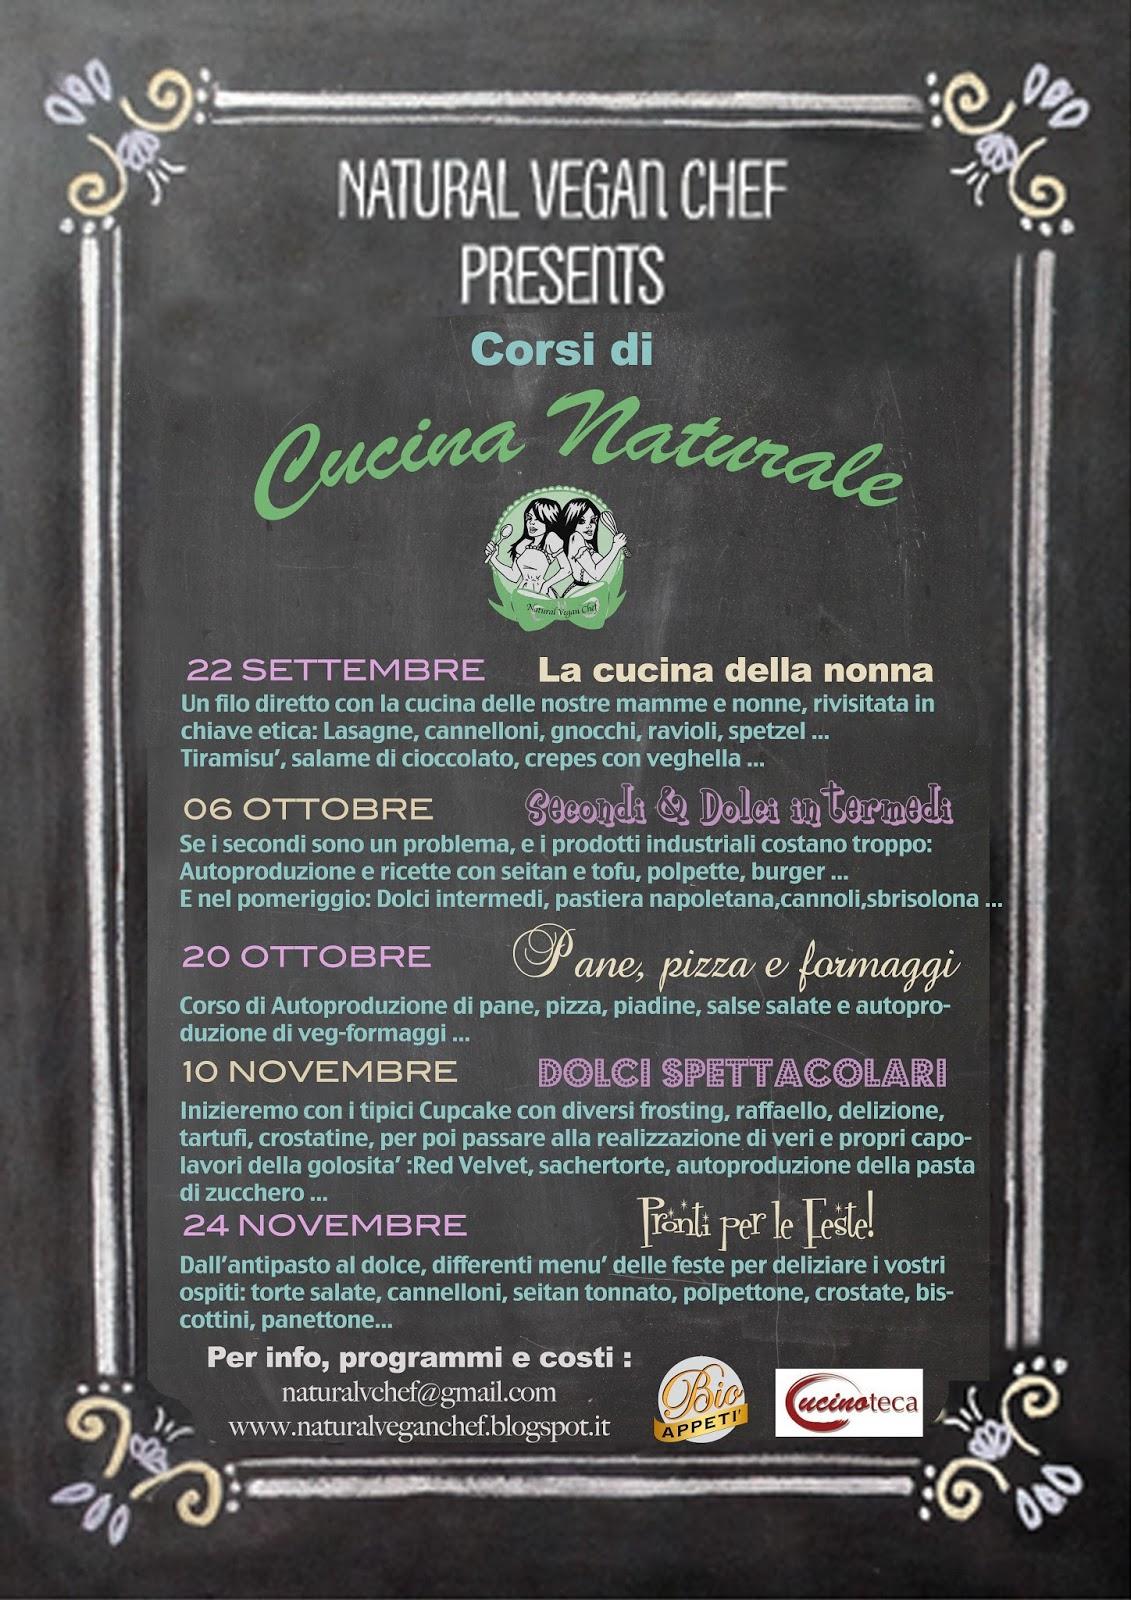 Fabulous life of a Vegan: CORSI DI CUCINA NATURALE 2013